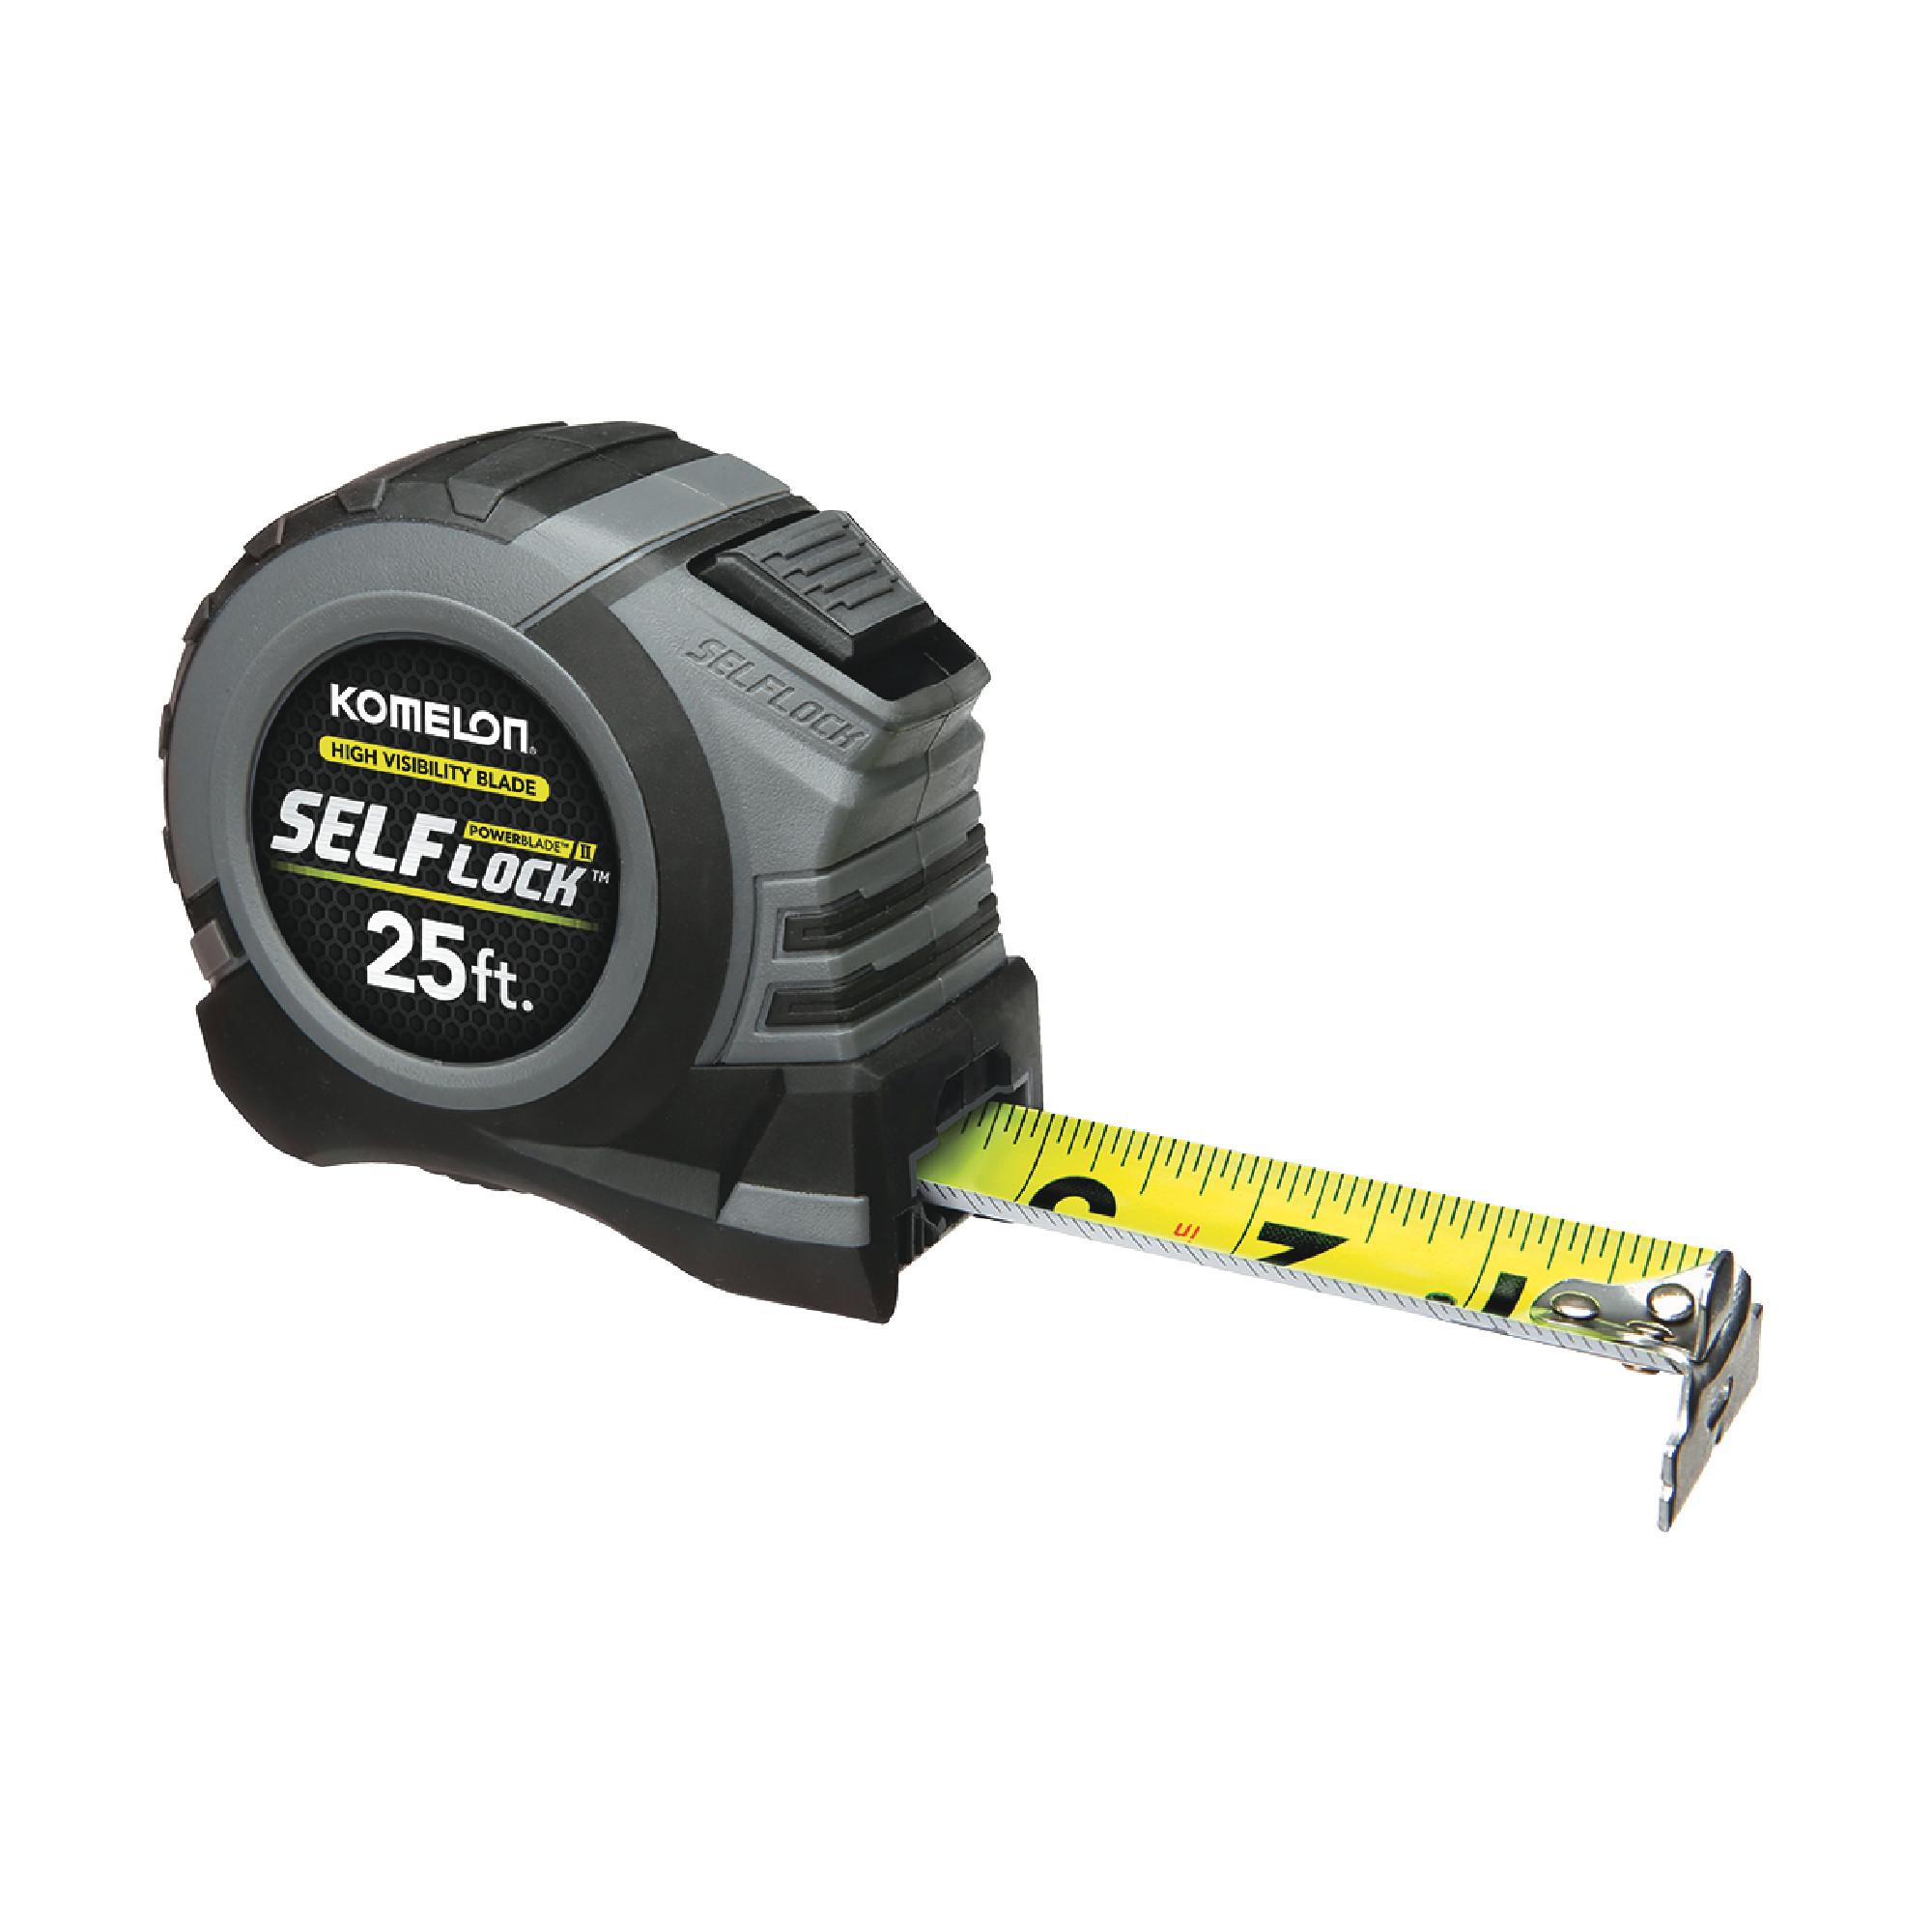 "1-1/16"" x 25' Self-Lock ABS PowerBlade II"